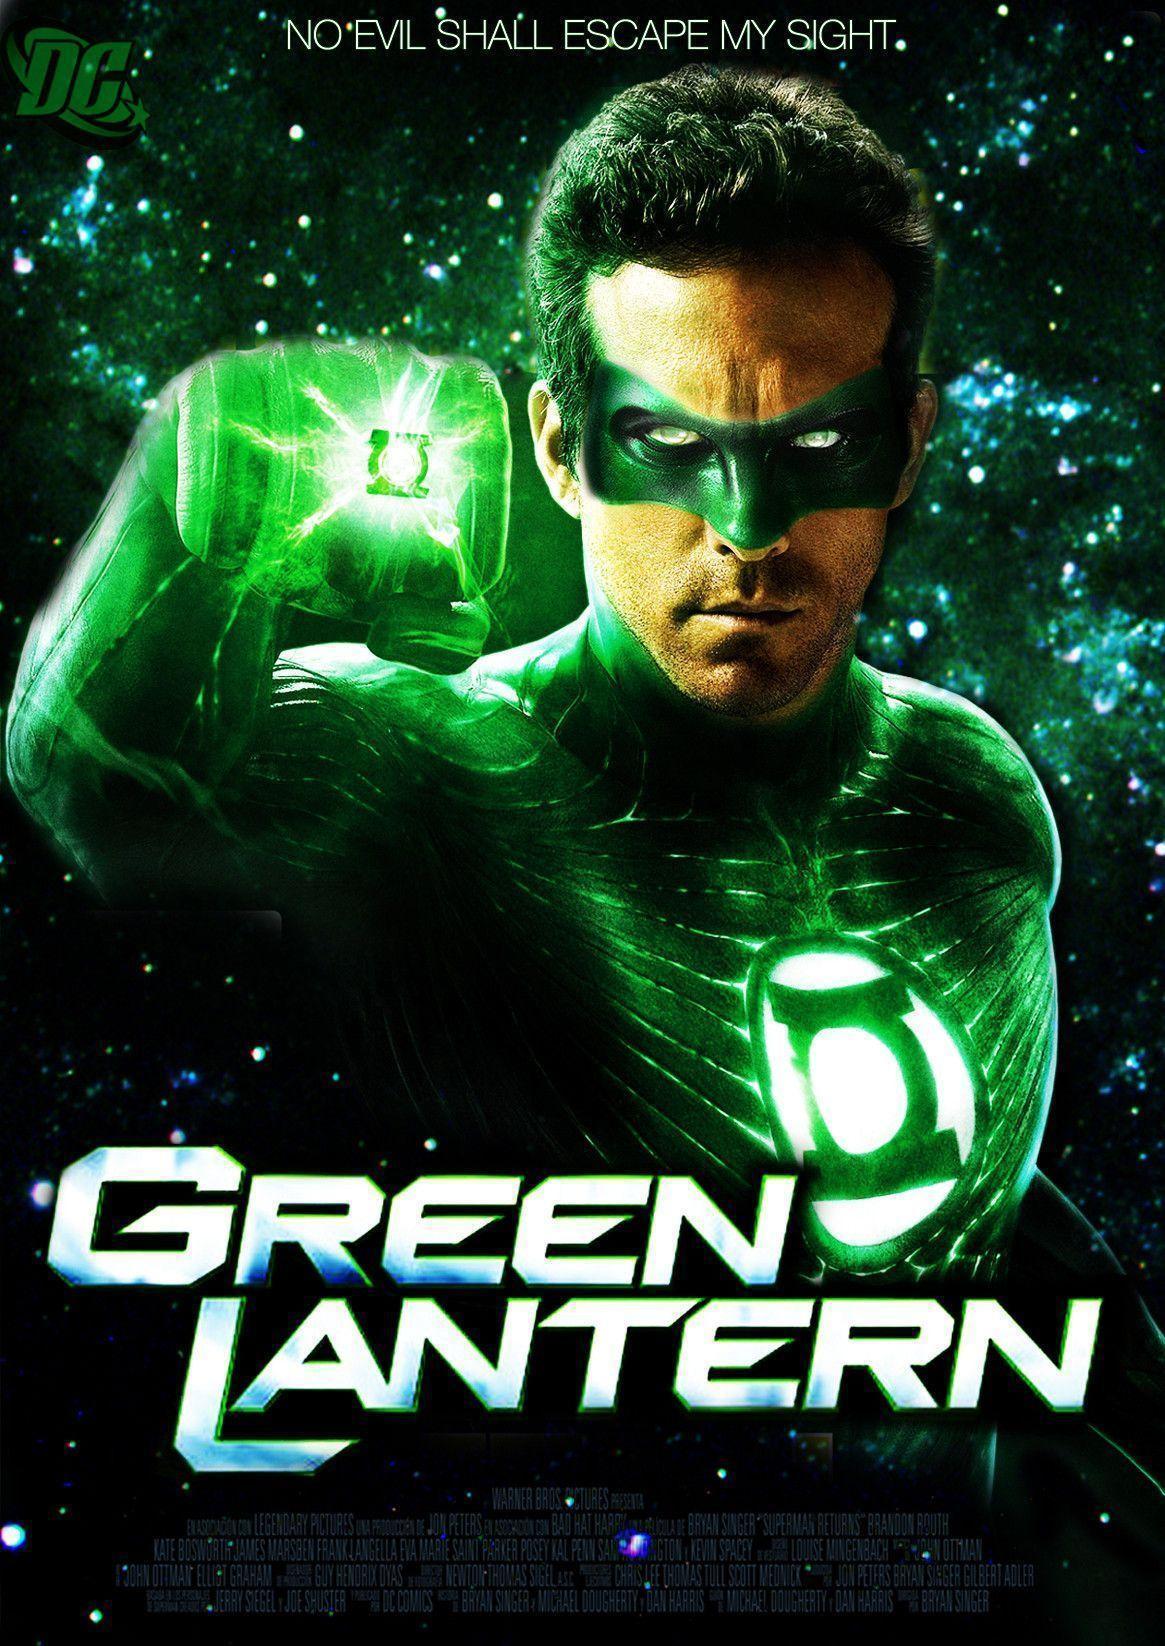 Green Lantern Movie Wallpapers - Wallpaper Cave Green Lantern Movie Poster